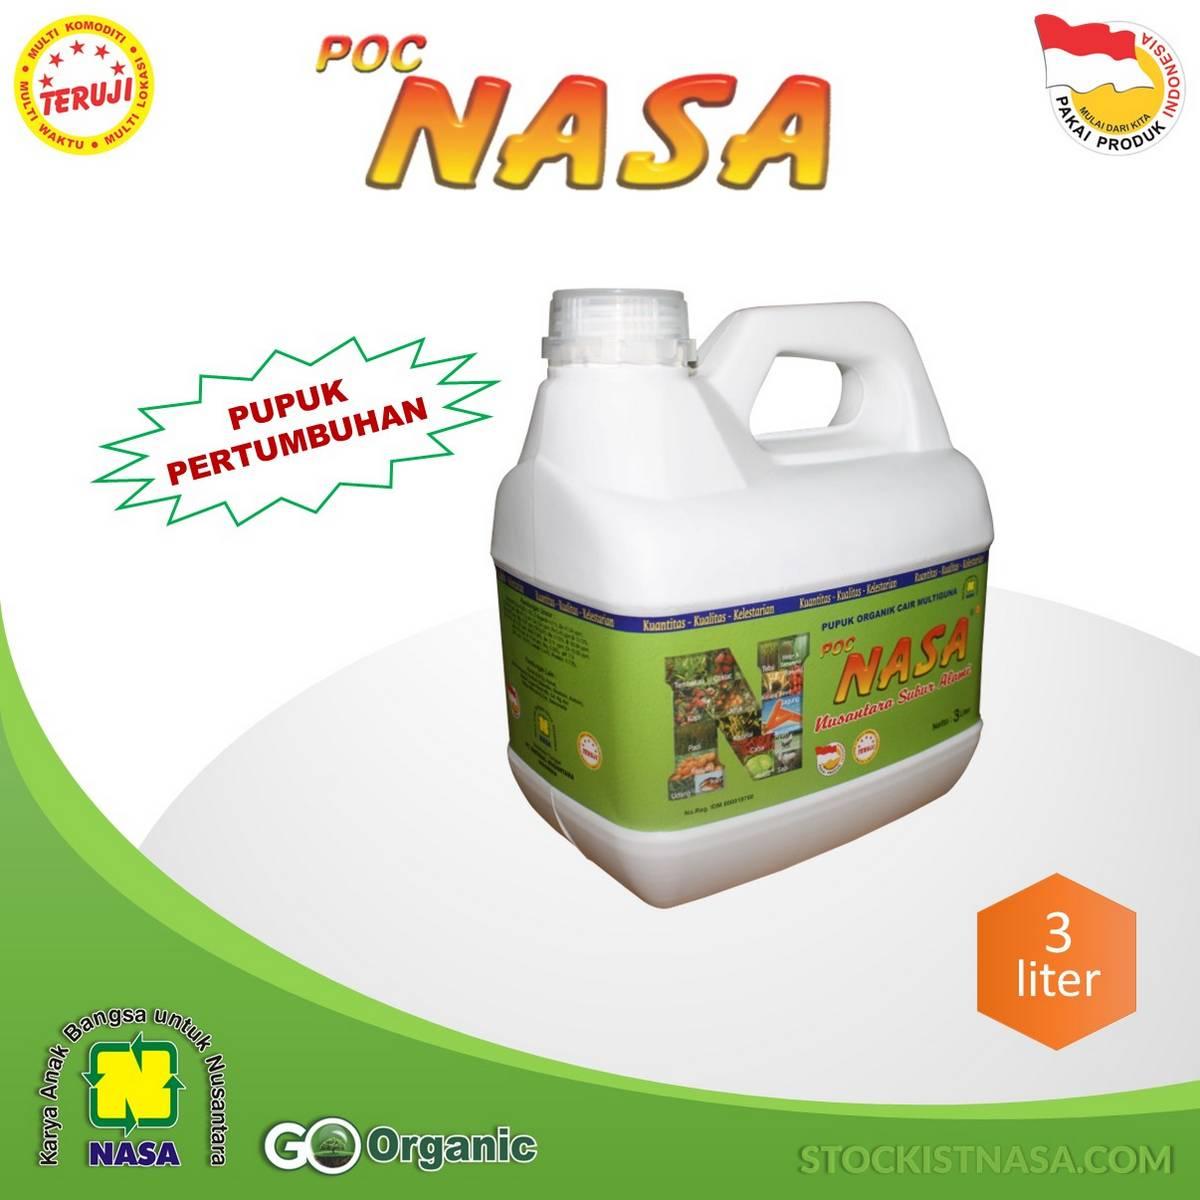 POC NASA Kemasan Besar